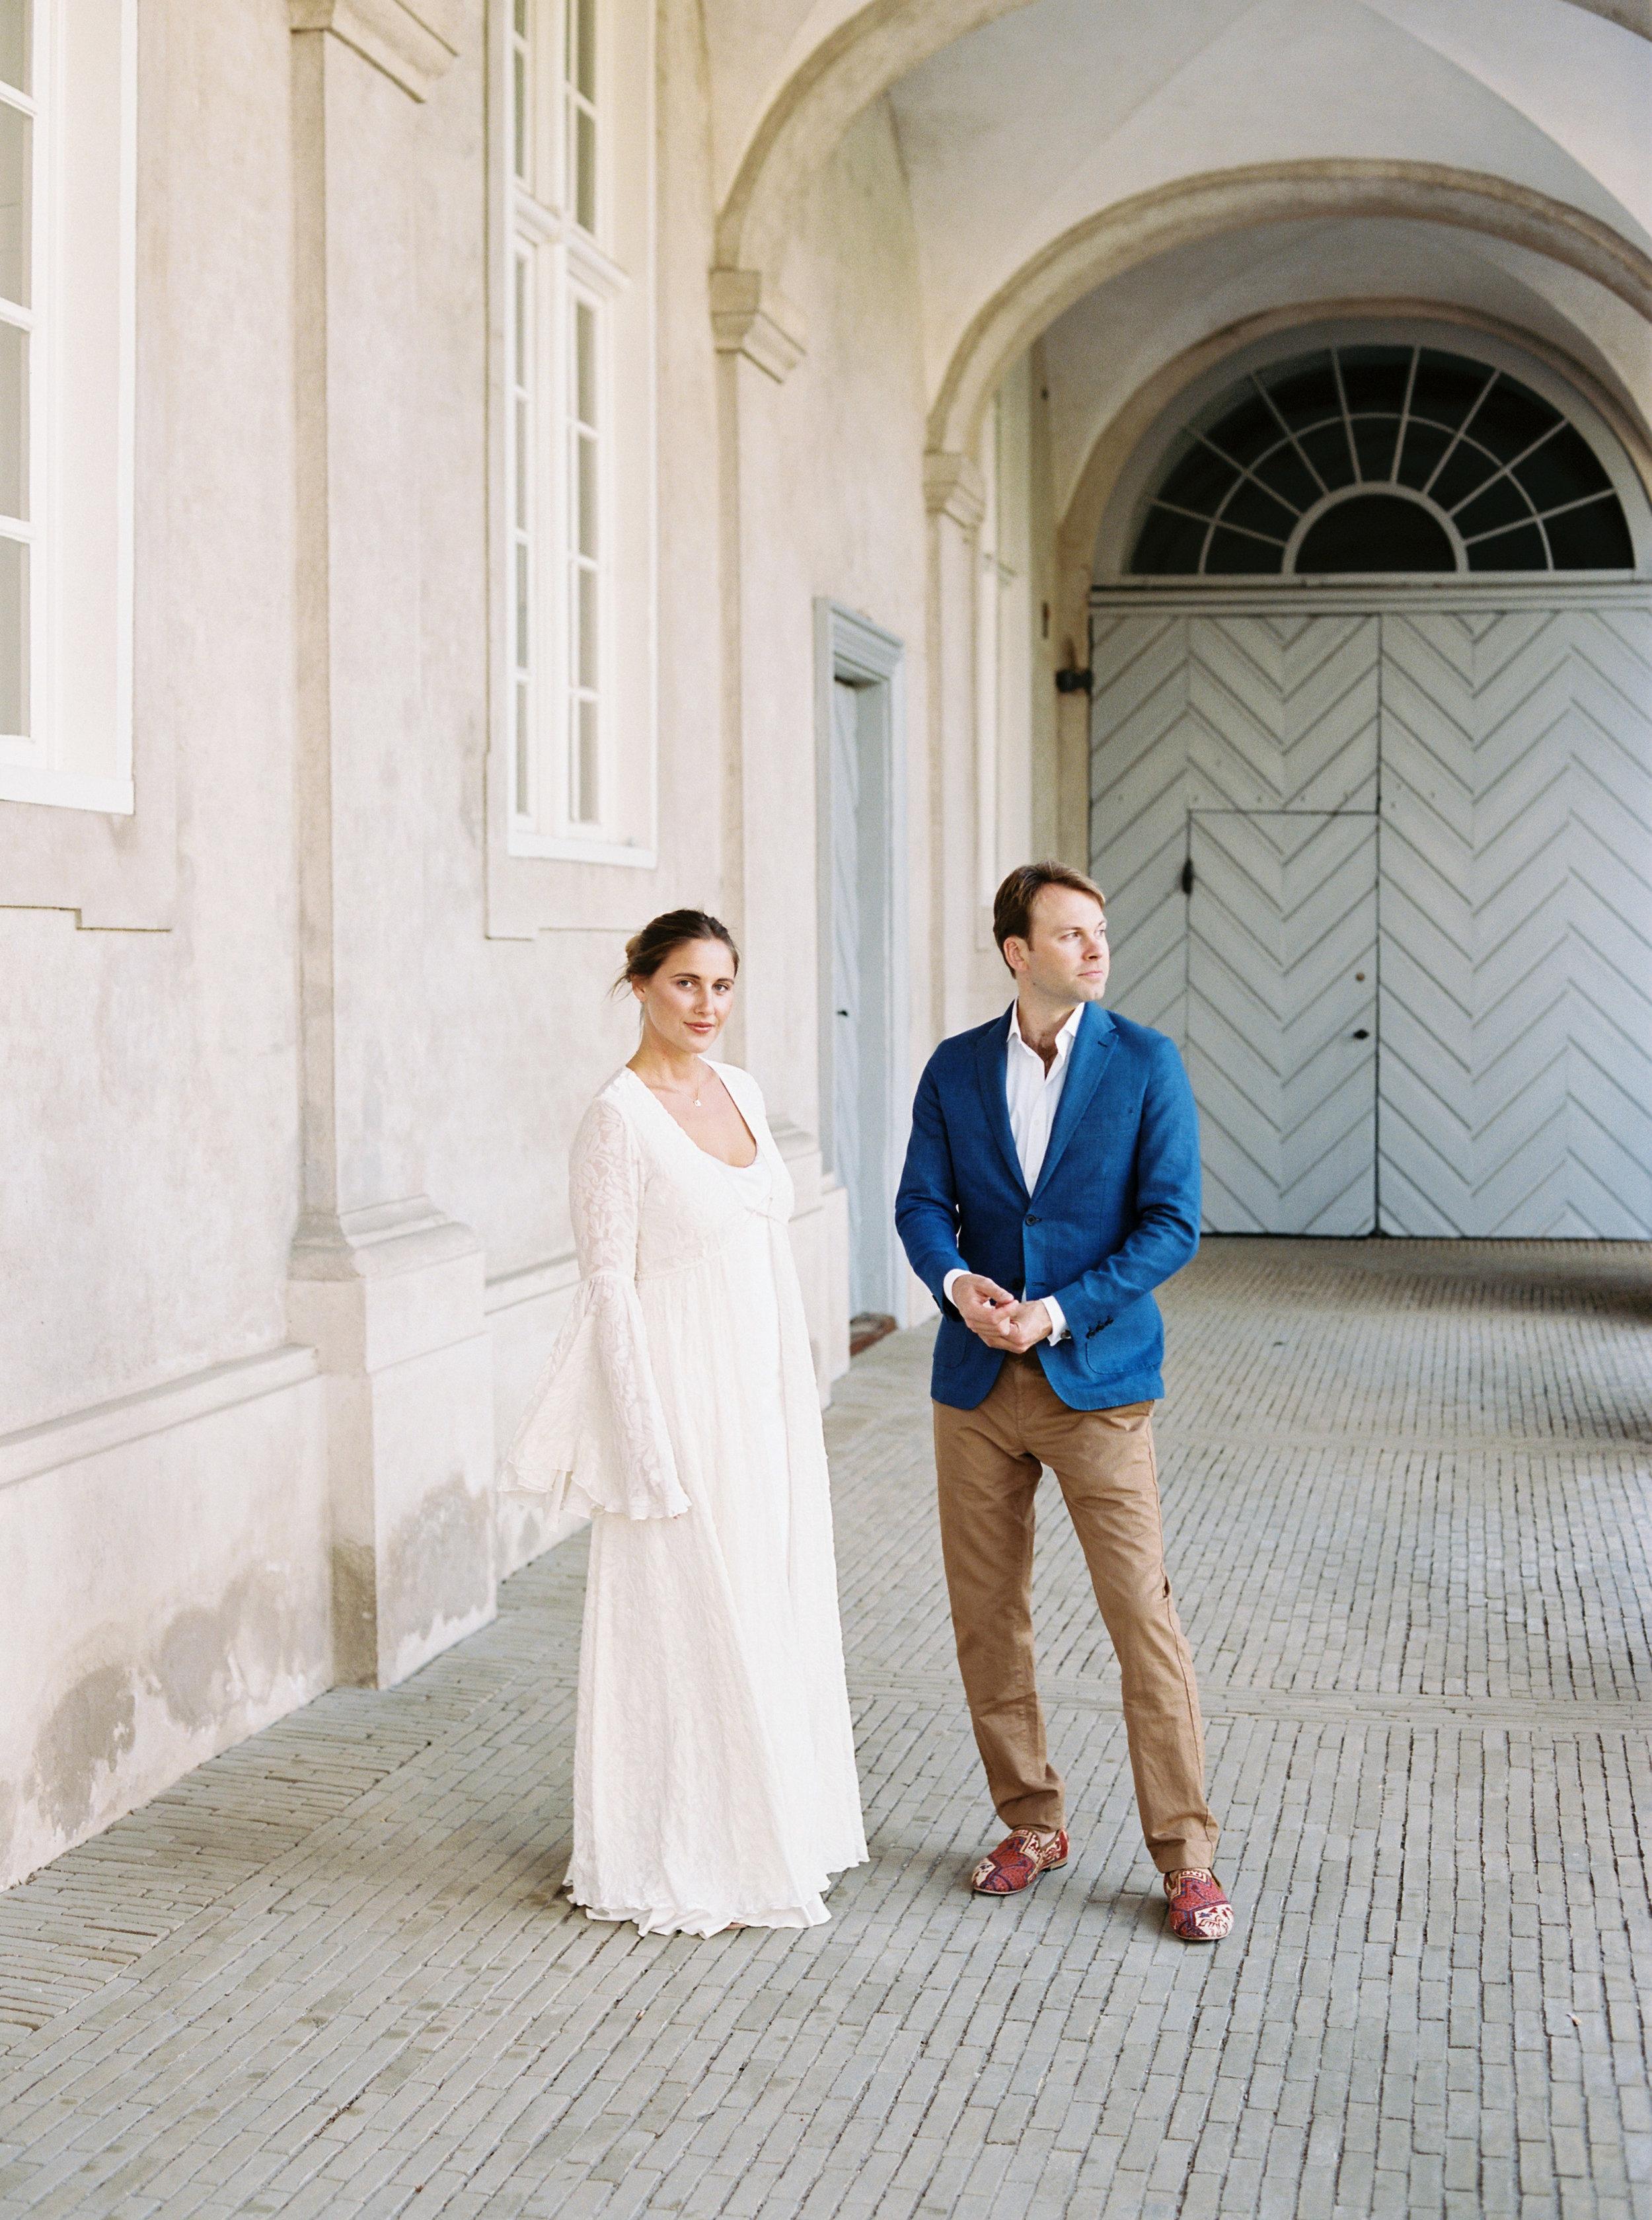 Kyle John l Fine Art Wedding Photography l Chicago, Copenhagen, California, New York, Destination l Blog l Alexis and Zach_Copenhagen Part 2_10